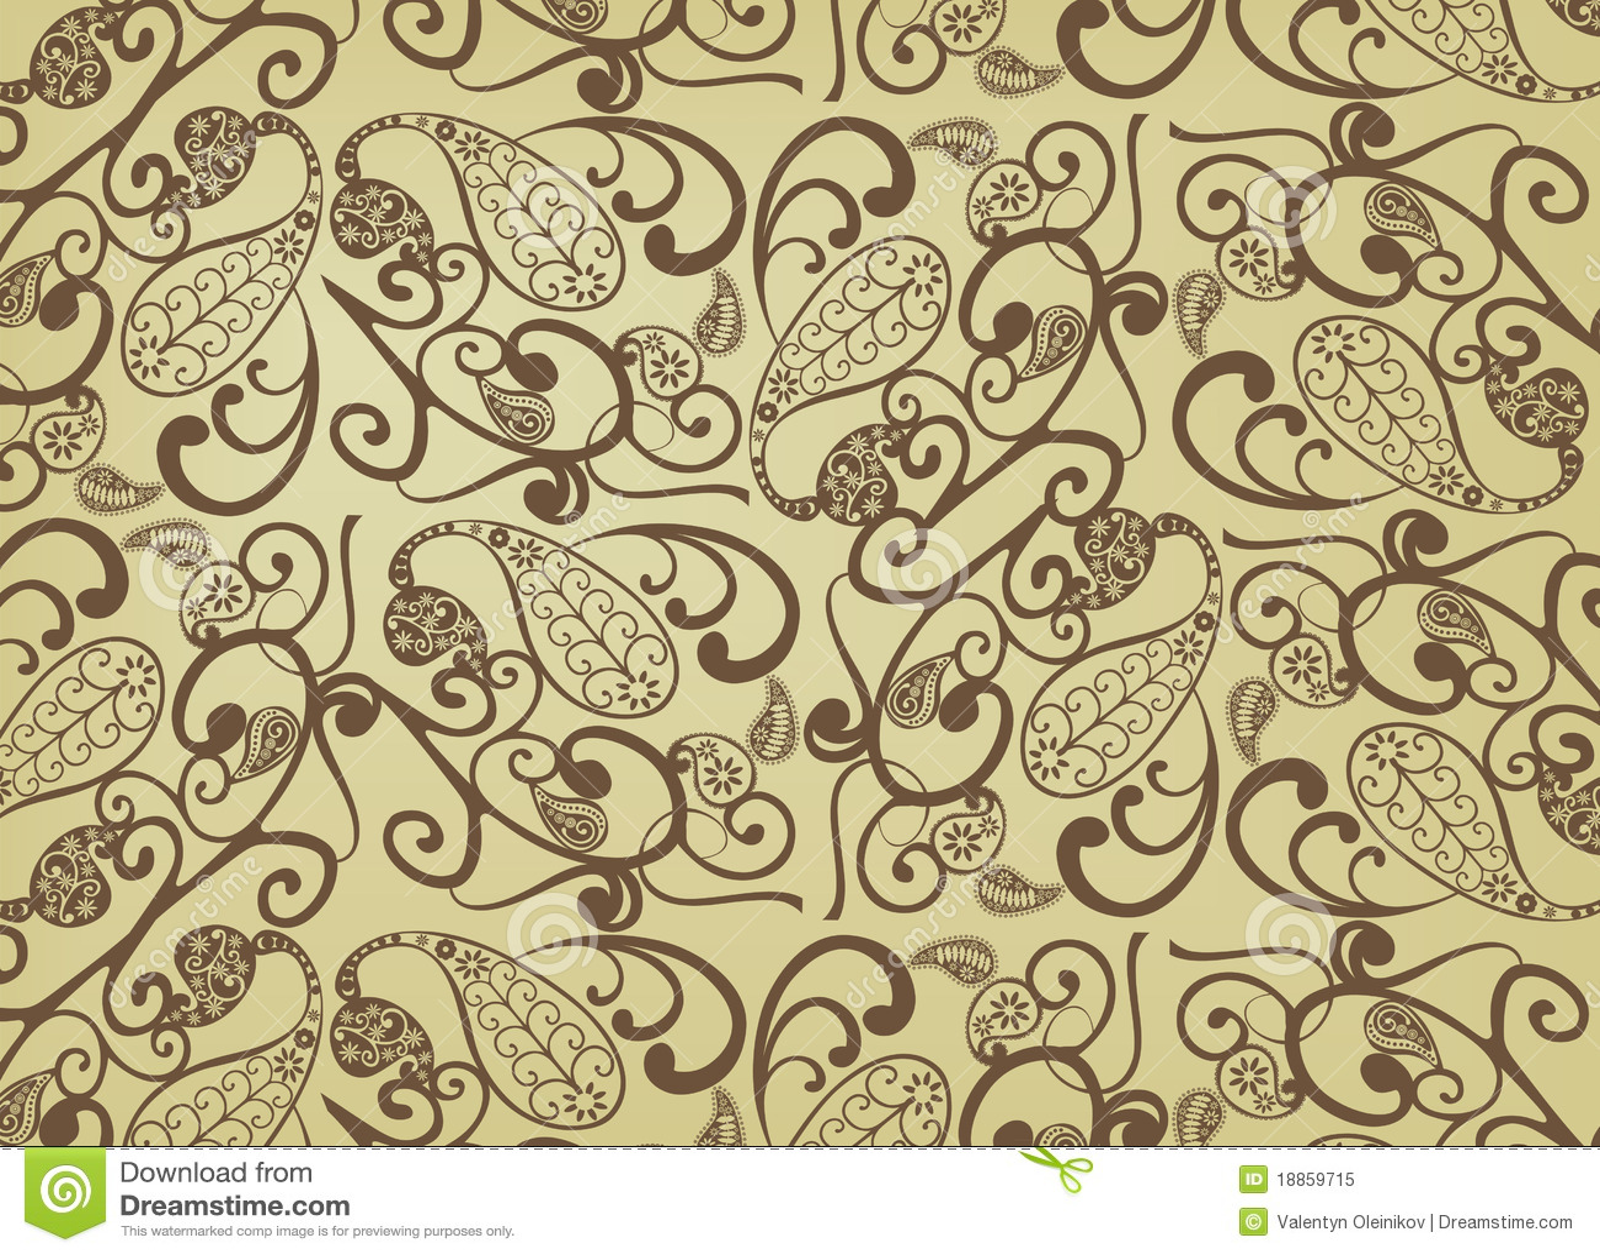 vector paisley pattern royalty free stock photo